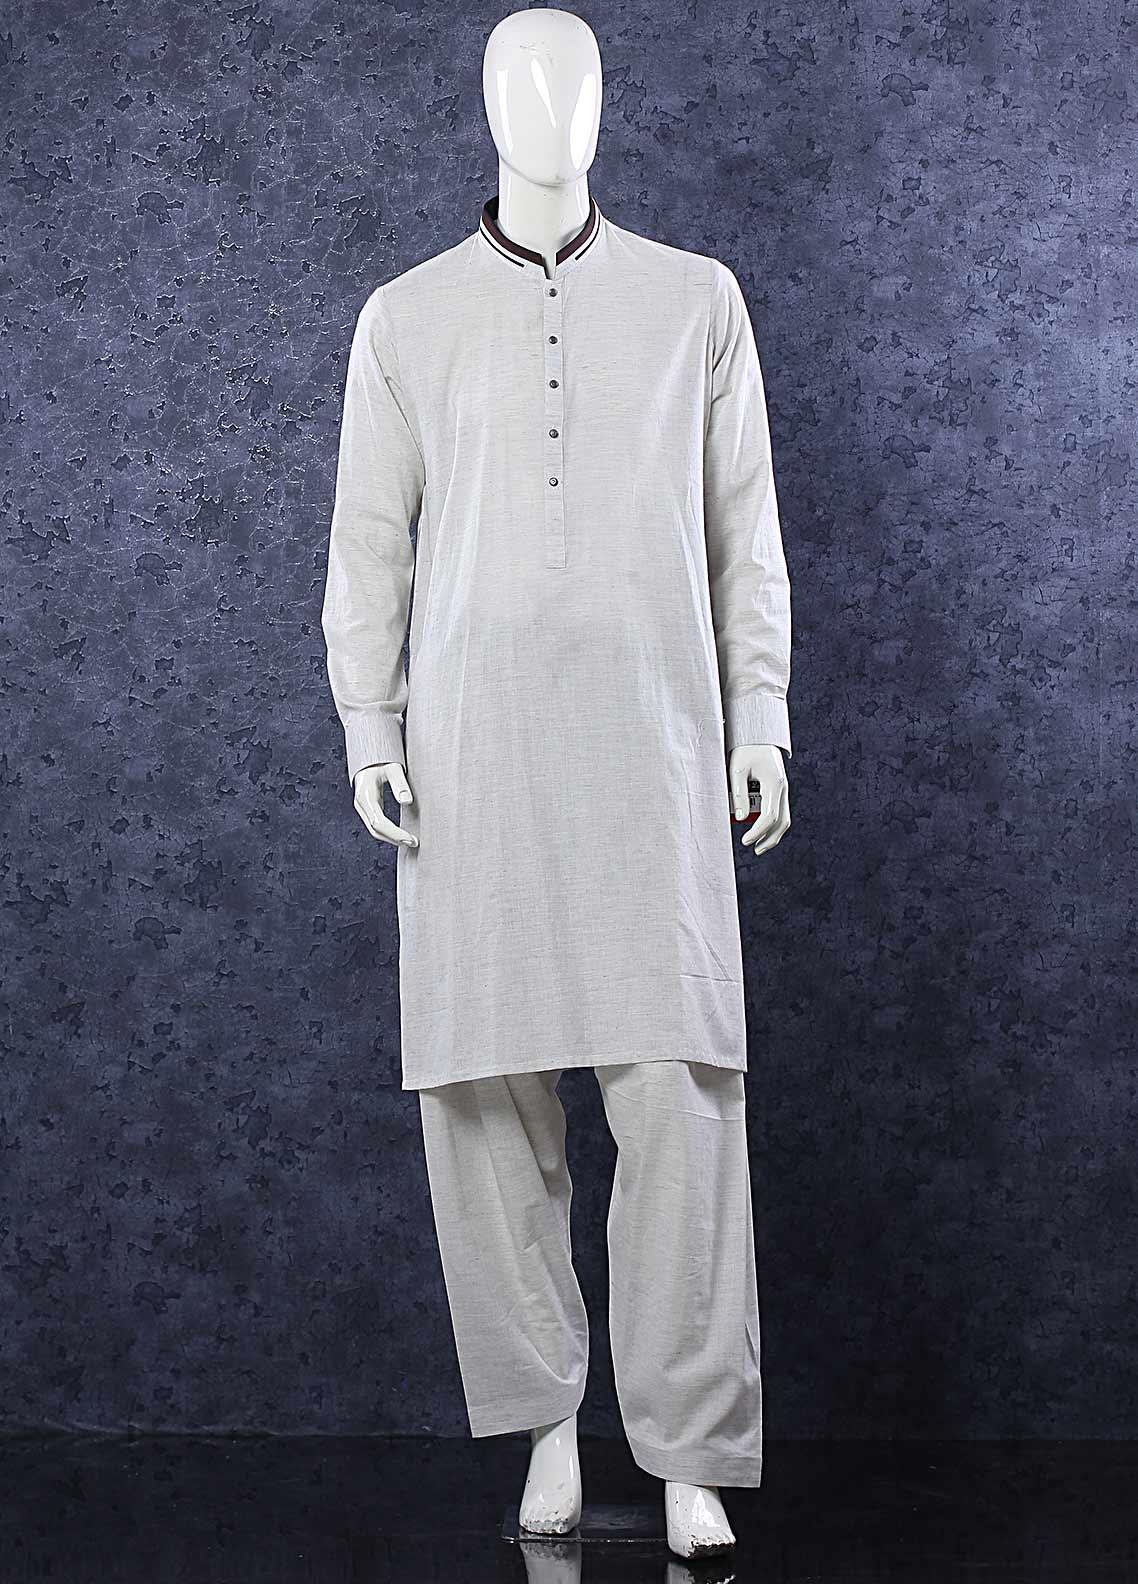 Aizaz Zafar Toyobo Formal Shalwar Kameez for Men -  D-685 Light Grey